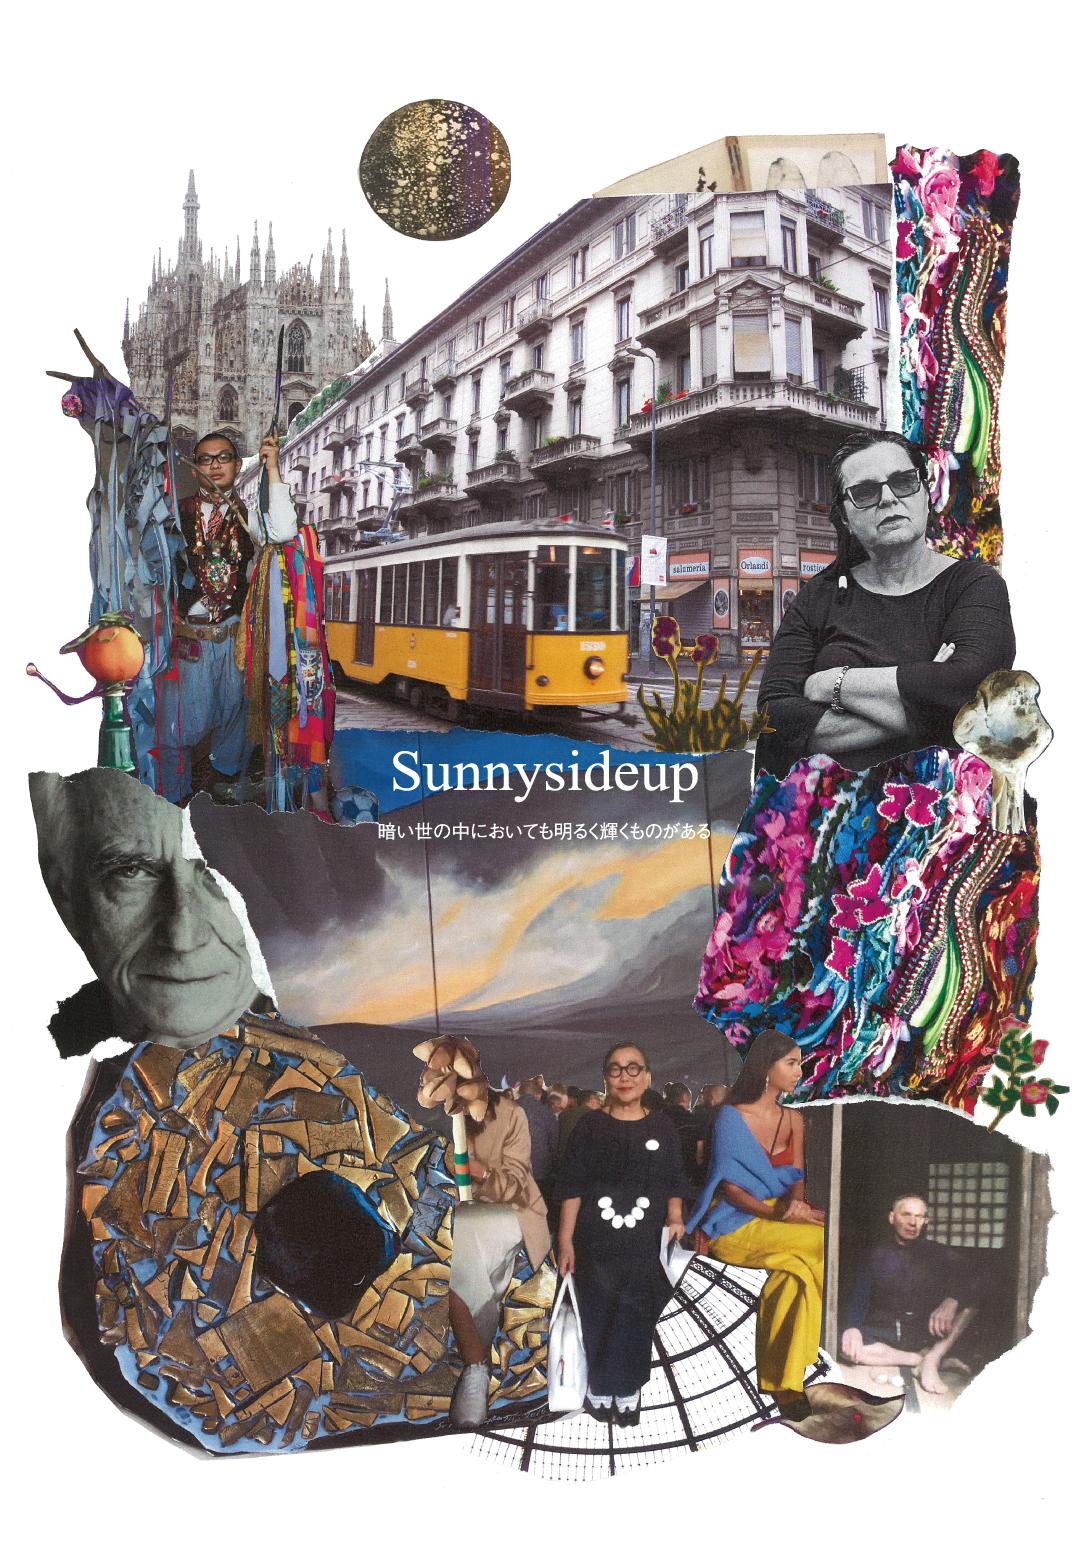 Sunnysideup〜暗い世の中において明るく輝くものがある〜